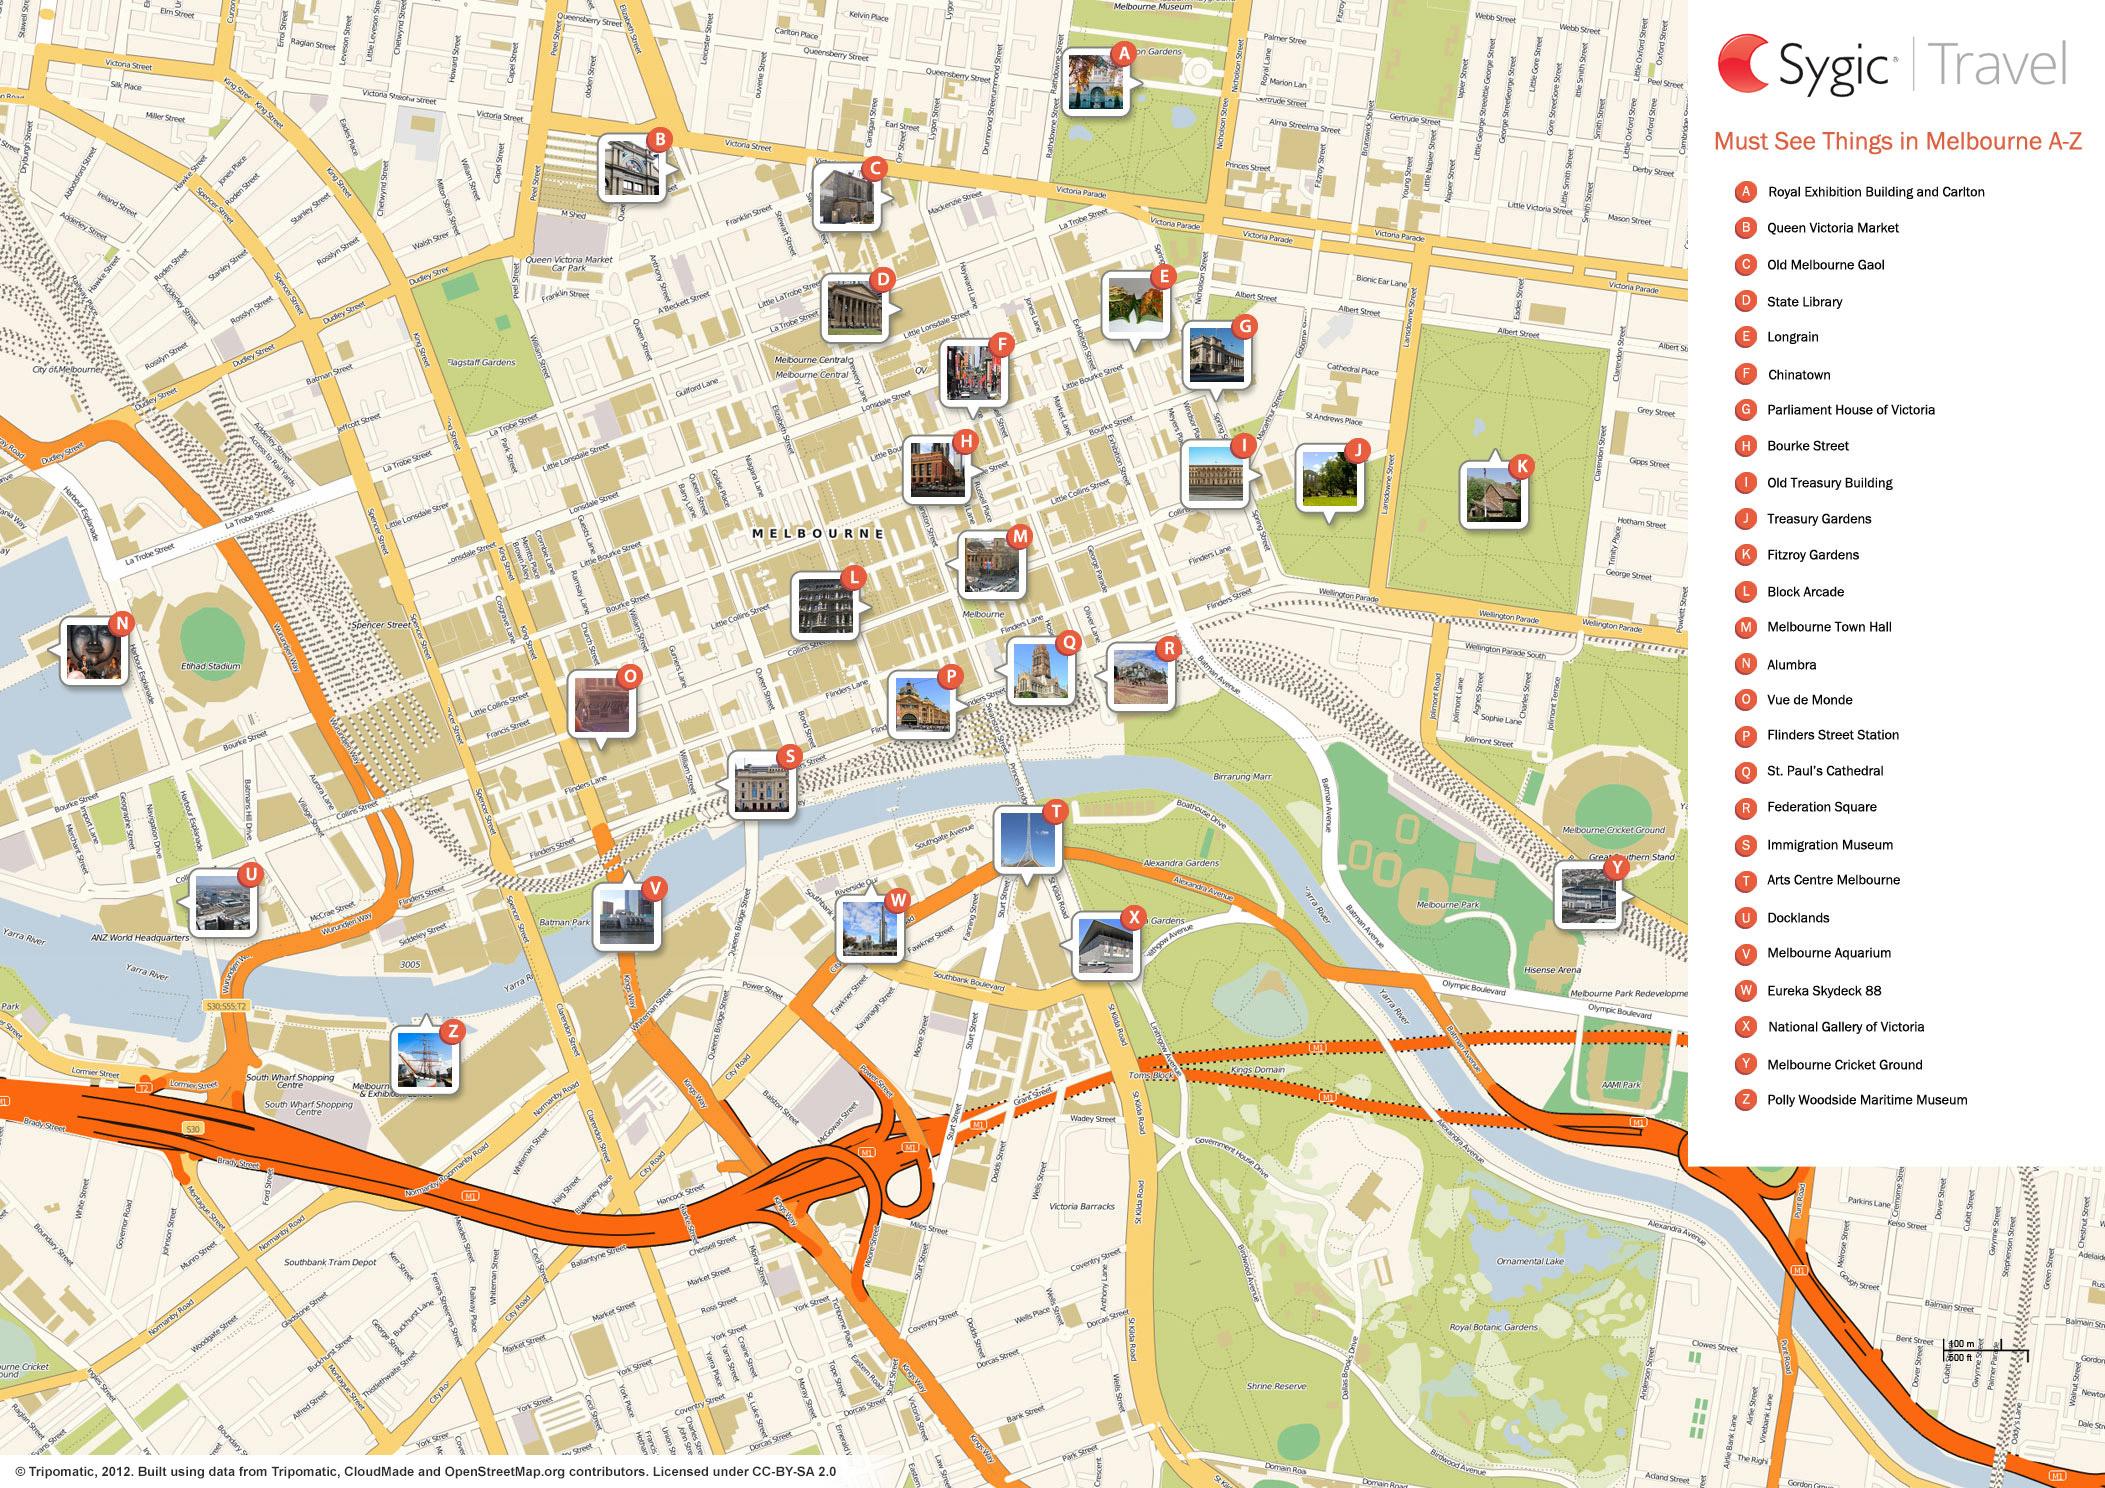 sydney city map tourist pdf to word - photo#24